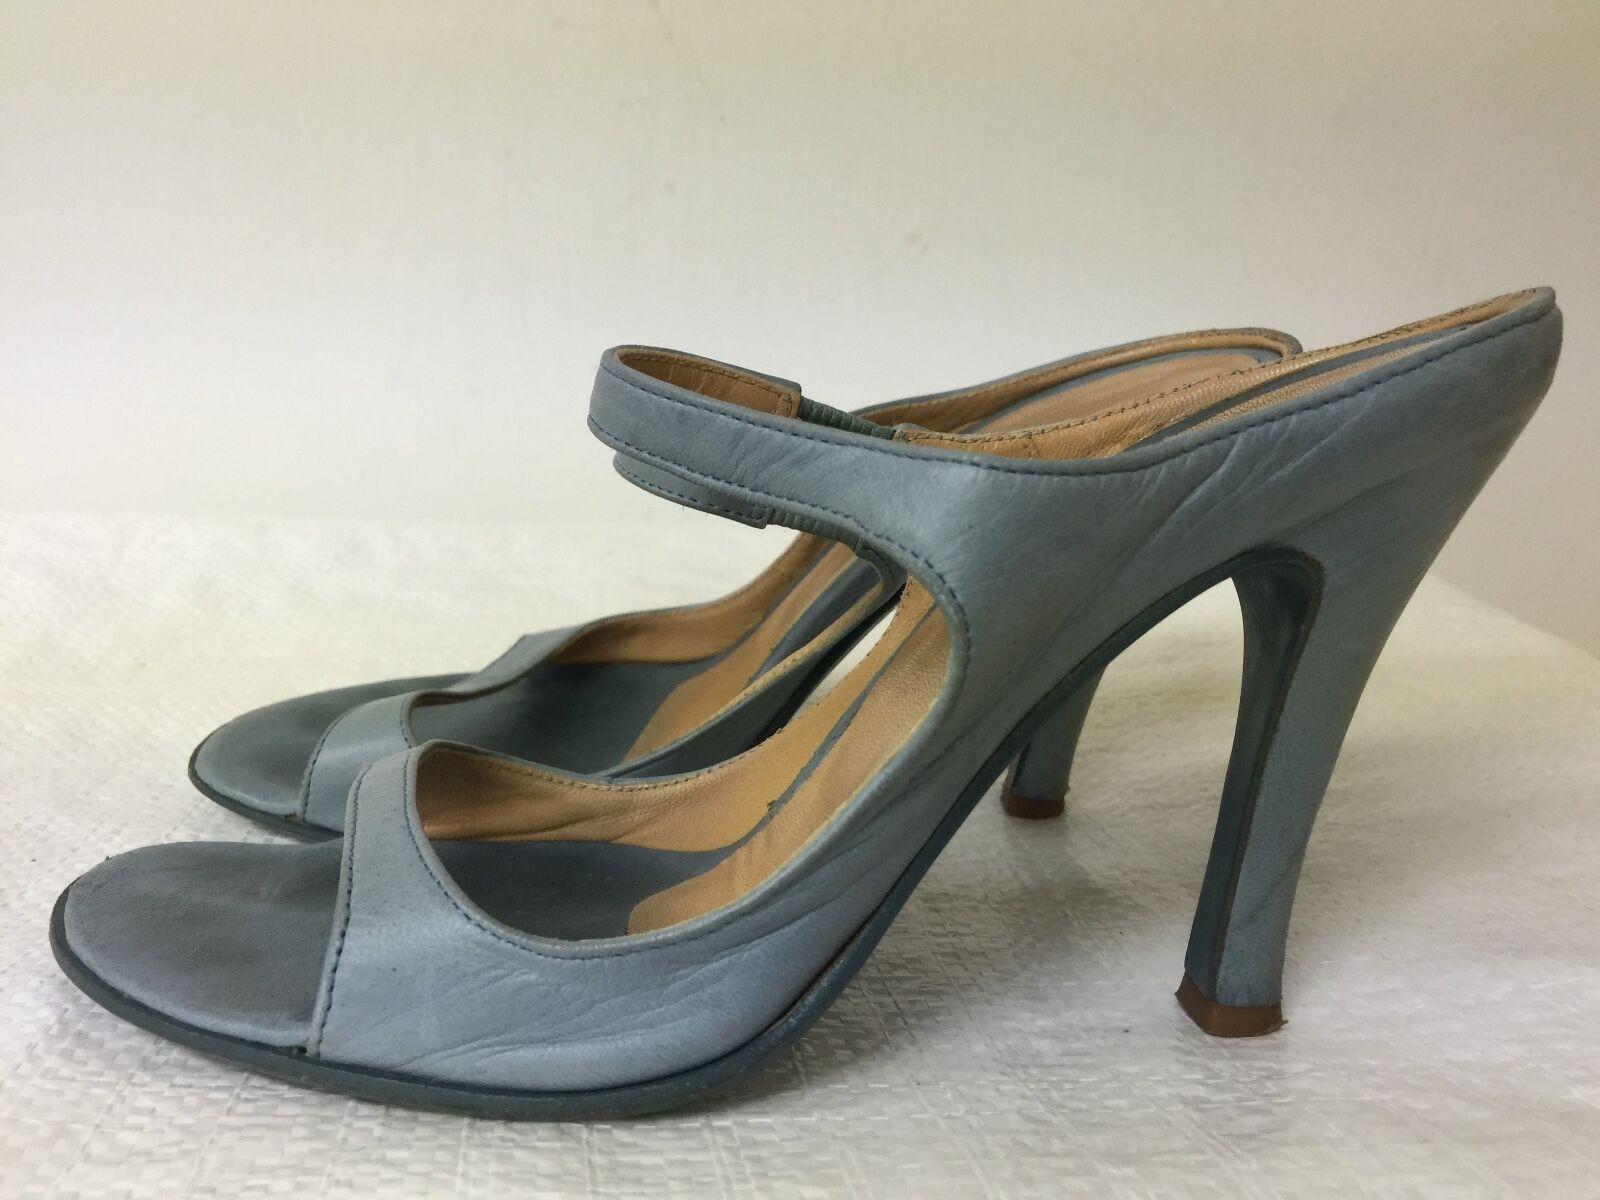 Burberry Prorsum damen Blau Blau Blau leather slip on heel Sandals Größe EUR 37.5 acb639